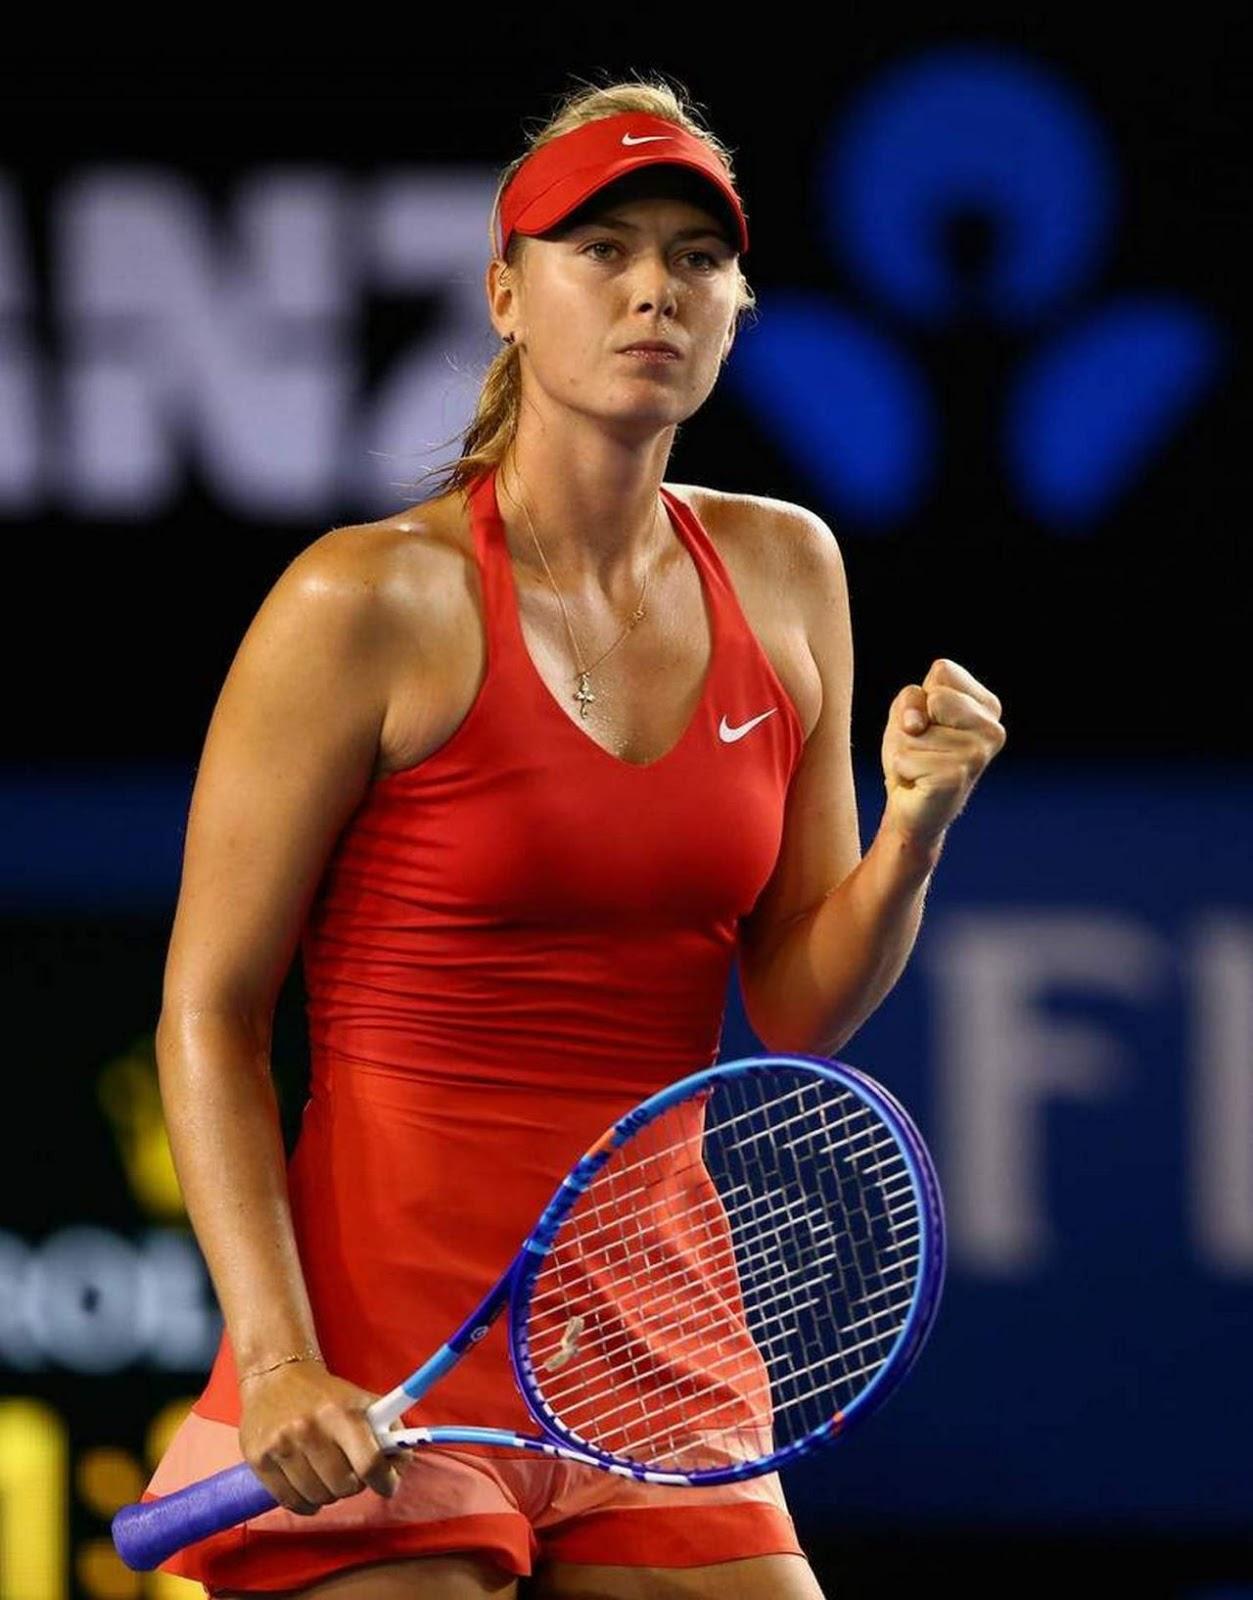 Maria sharapova best of practice session - 5 9